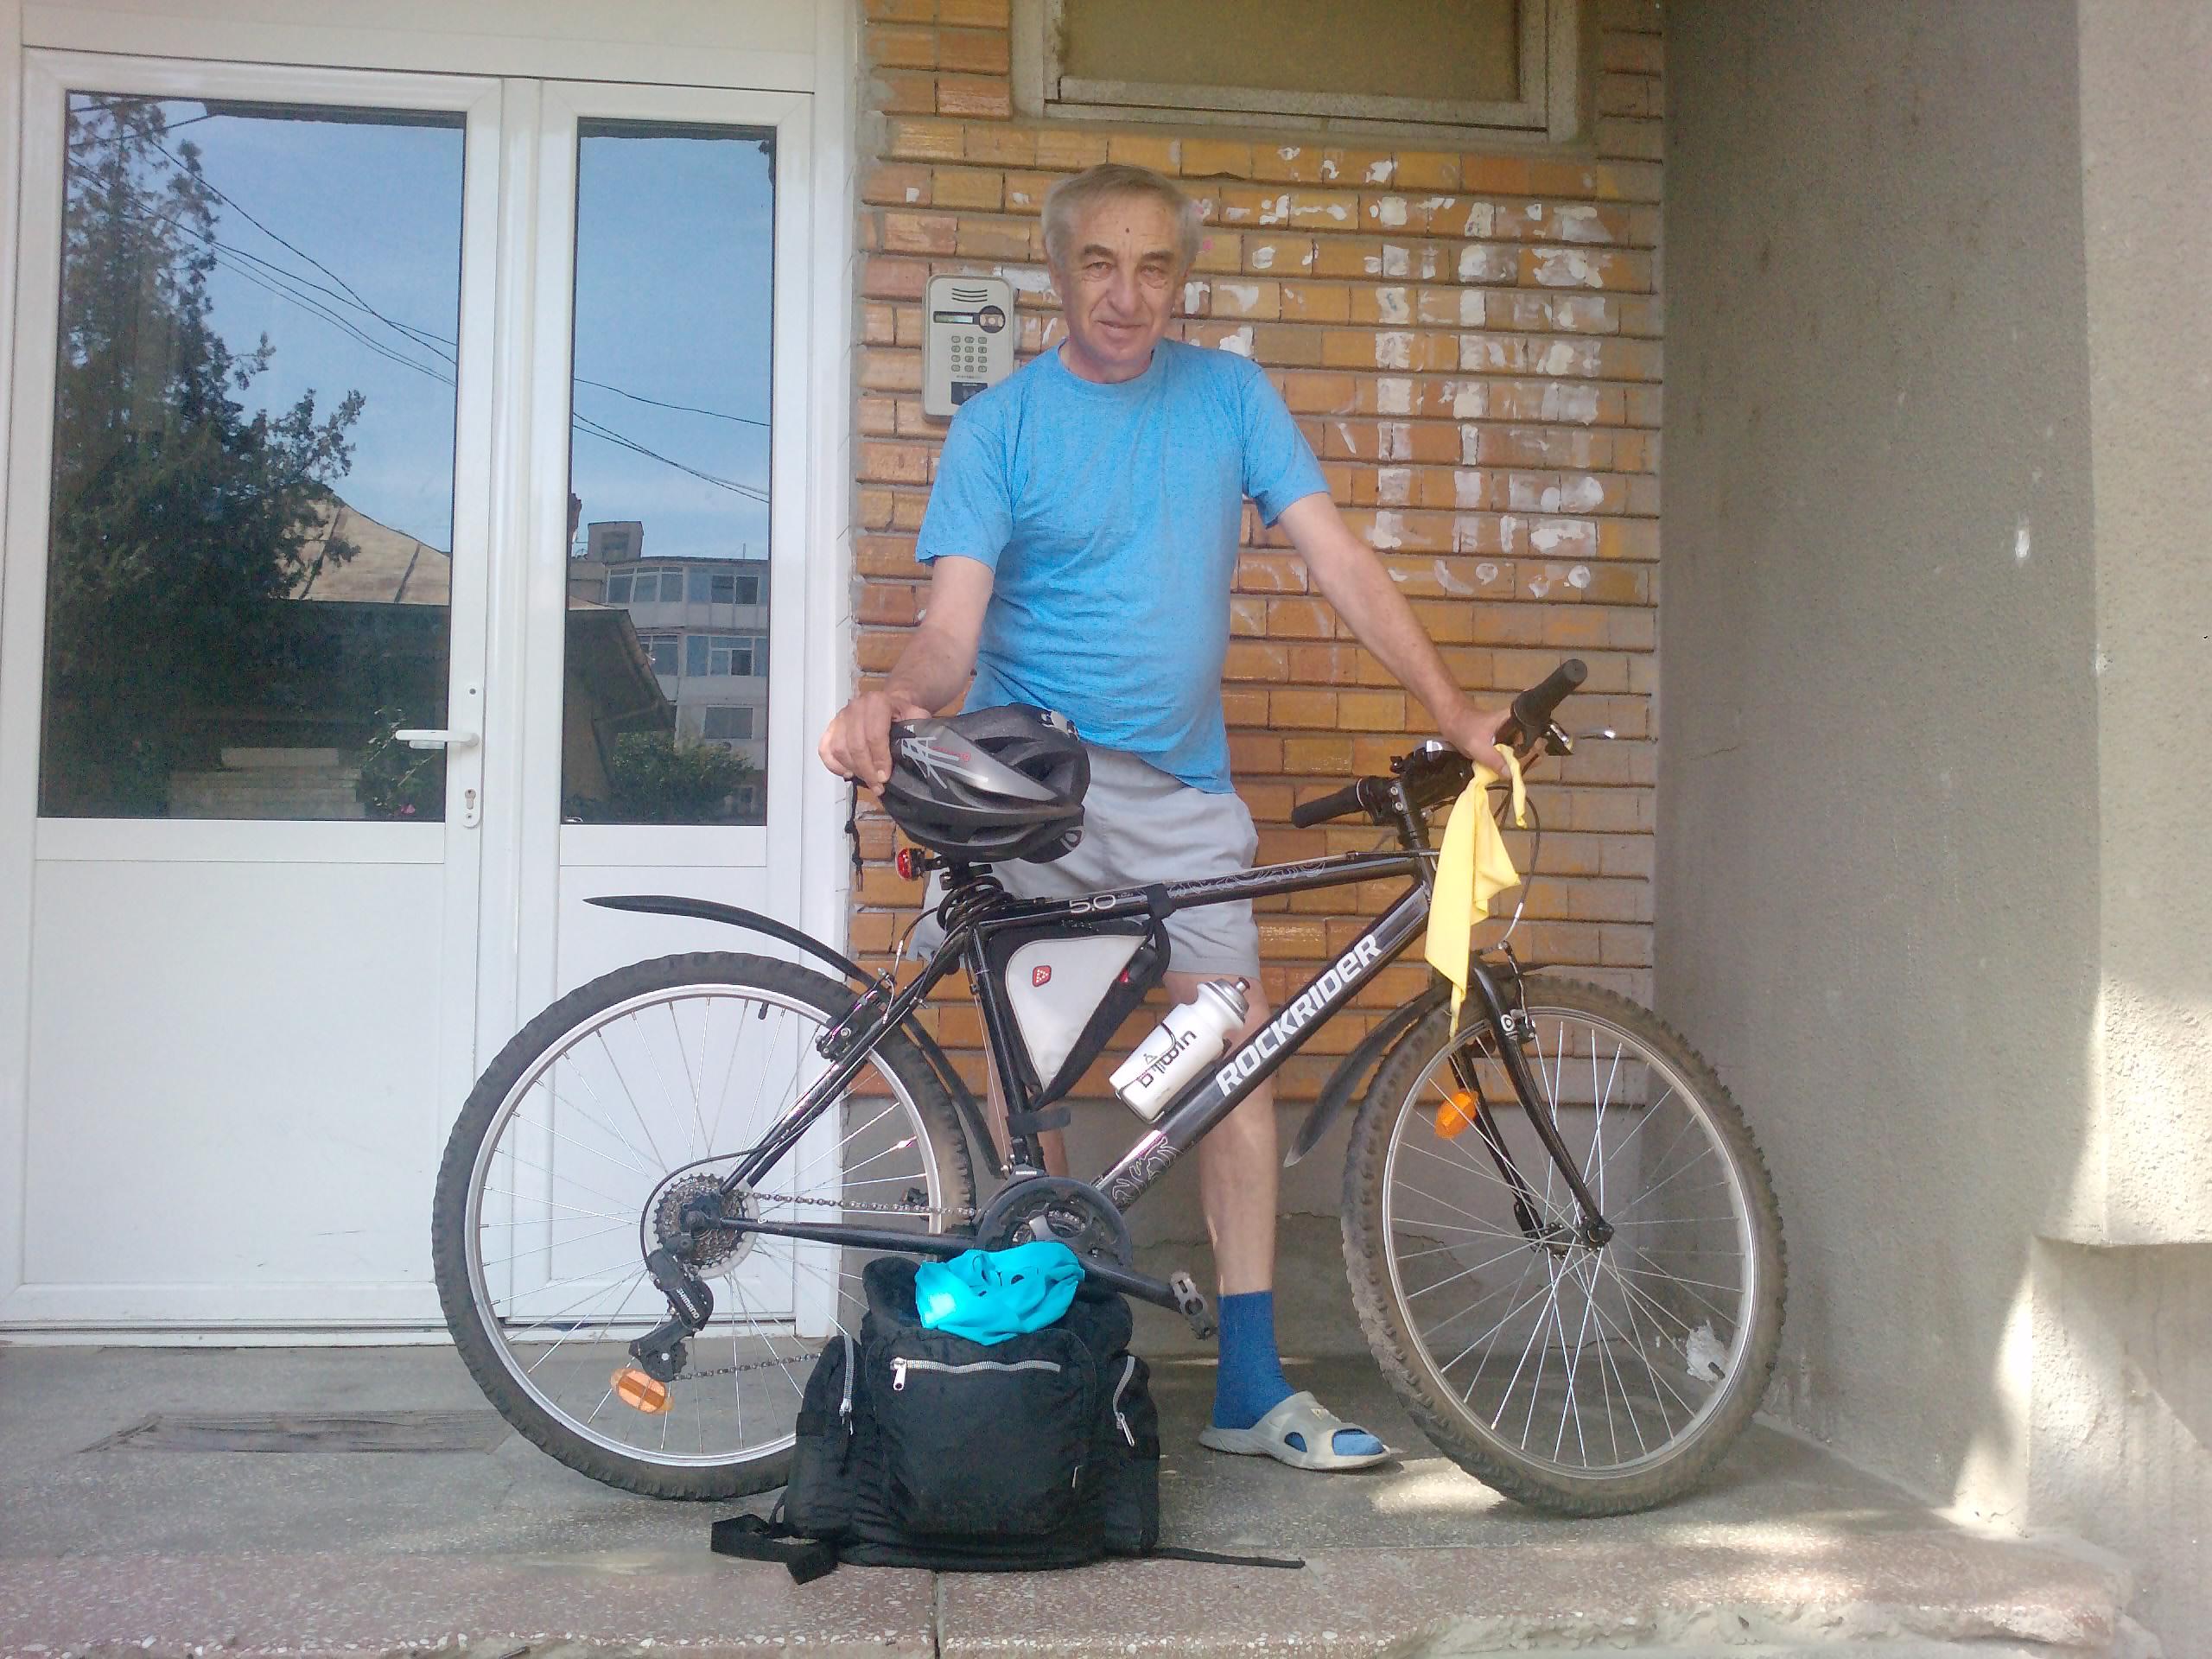 160 Km singur pe bicla - echipa tehnica